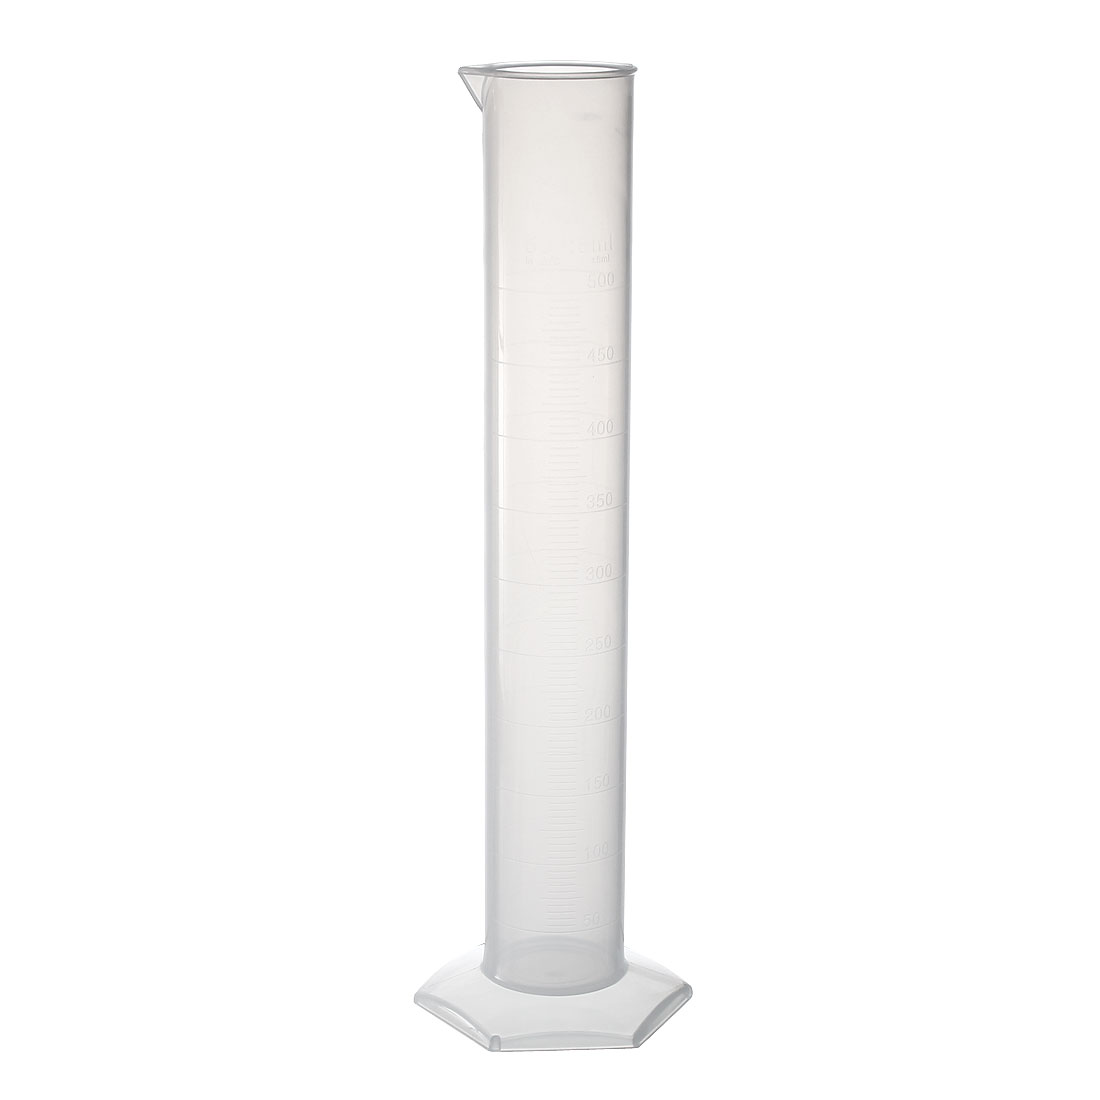 500ml Laboratory Measurements Clear White Plastic Hex Base